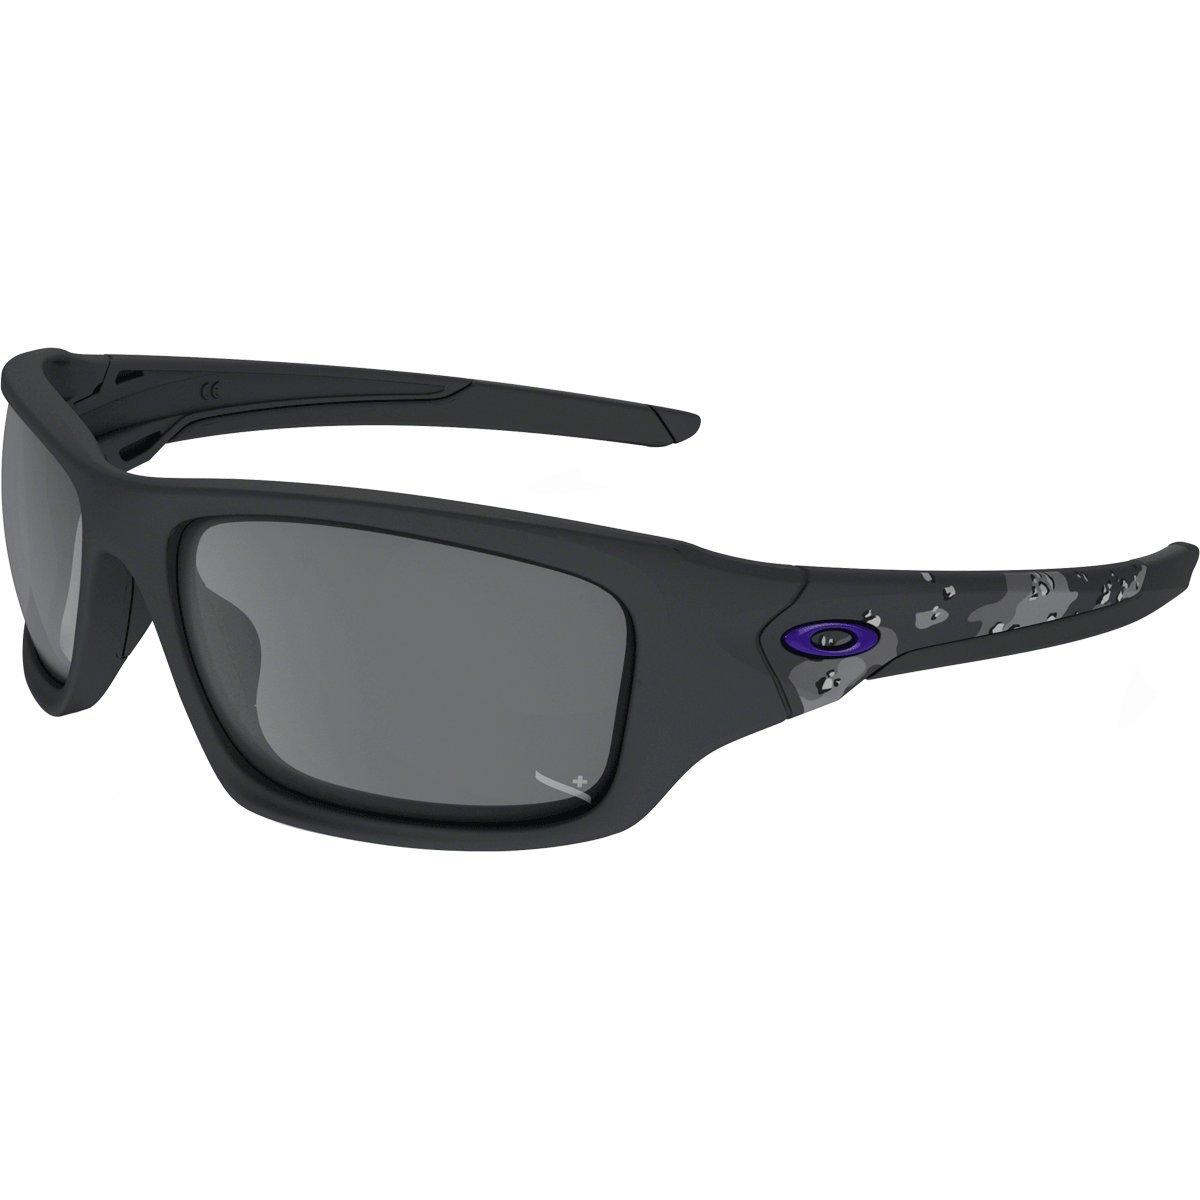 Oakley Men's Valve Rectangular, Carbon, 60 mm